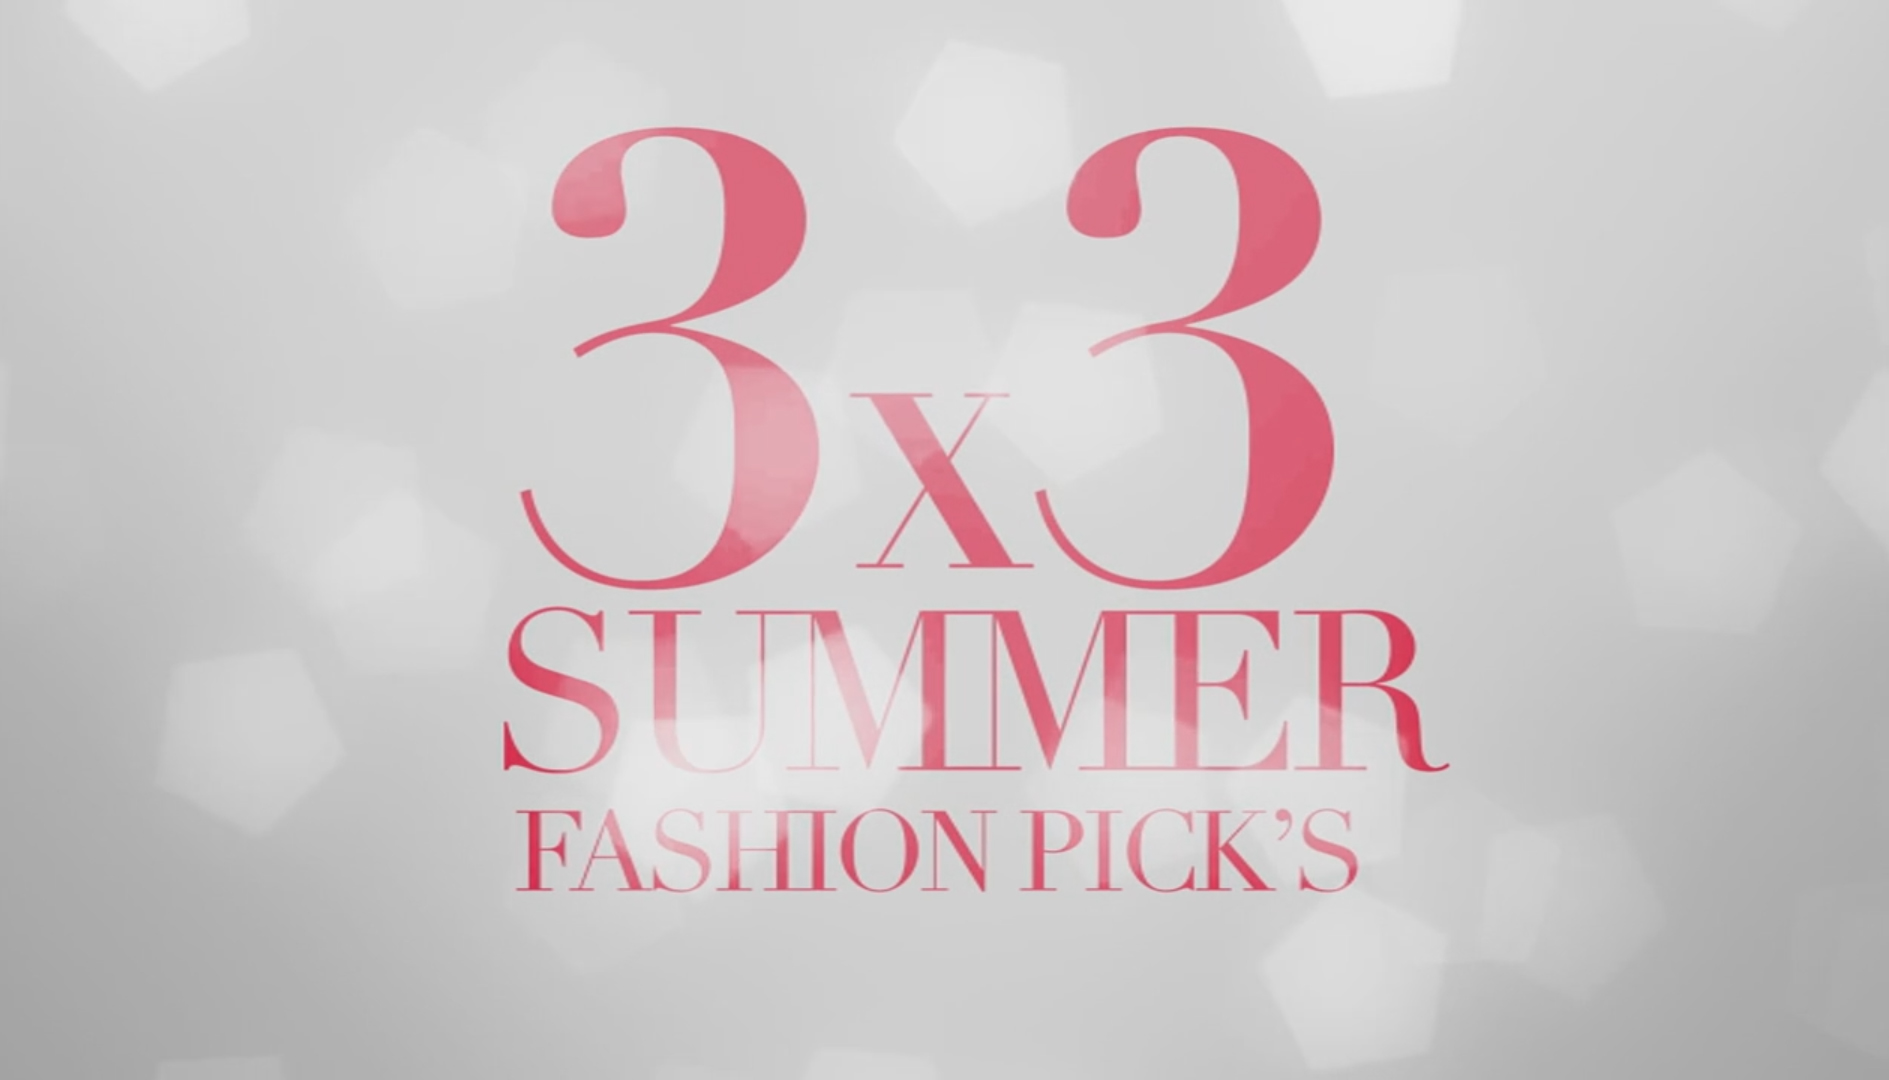 9 Summer Fashion Picks